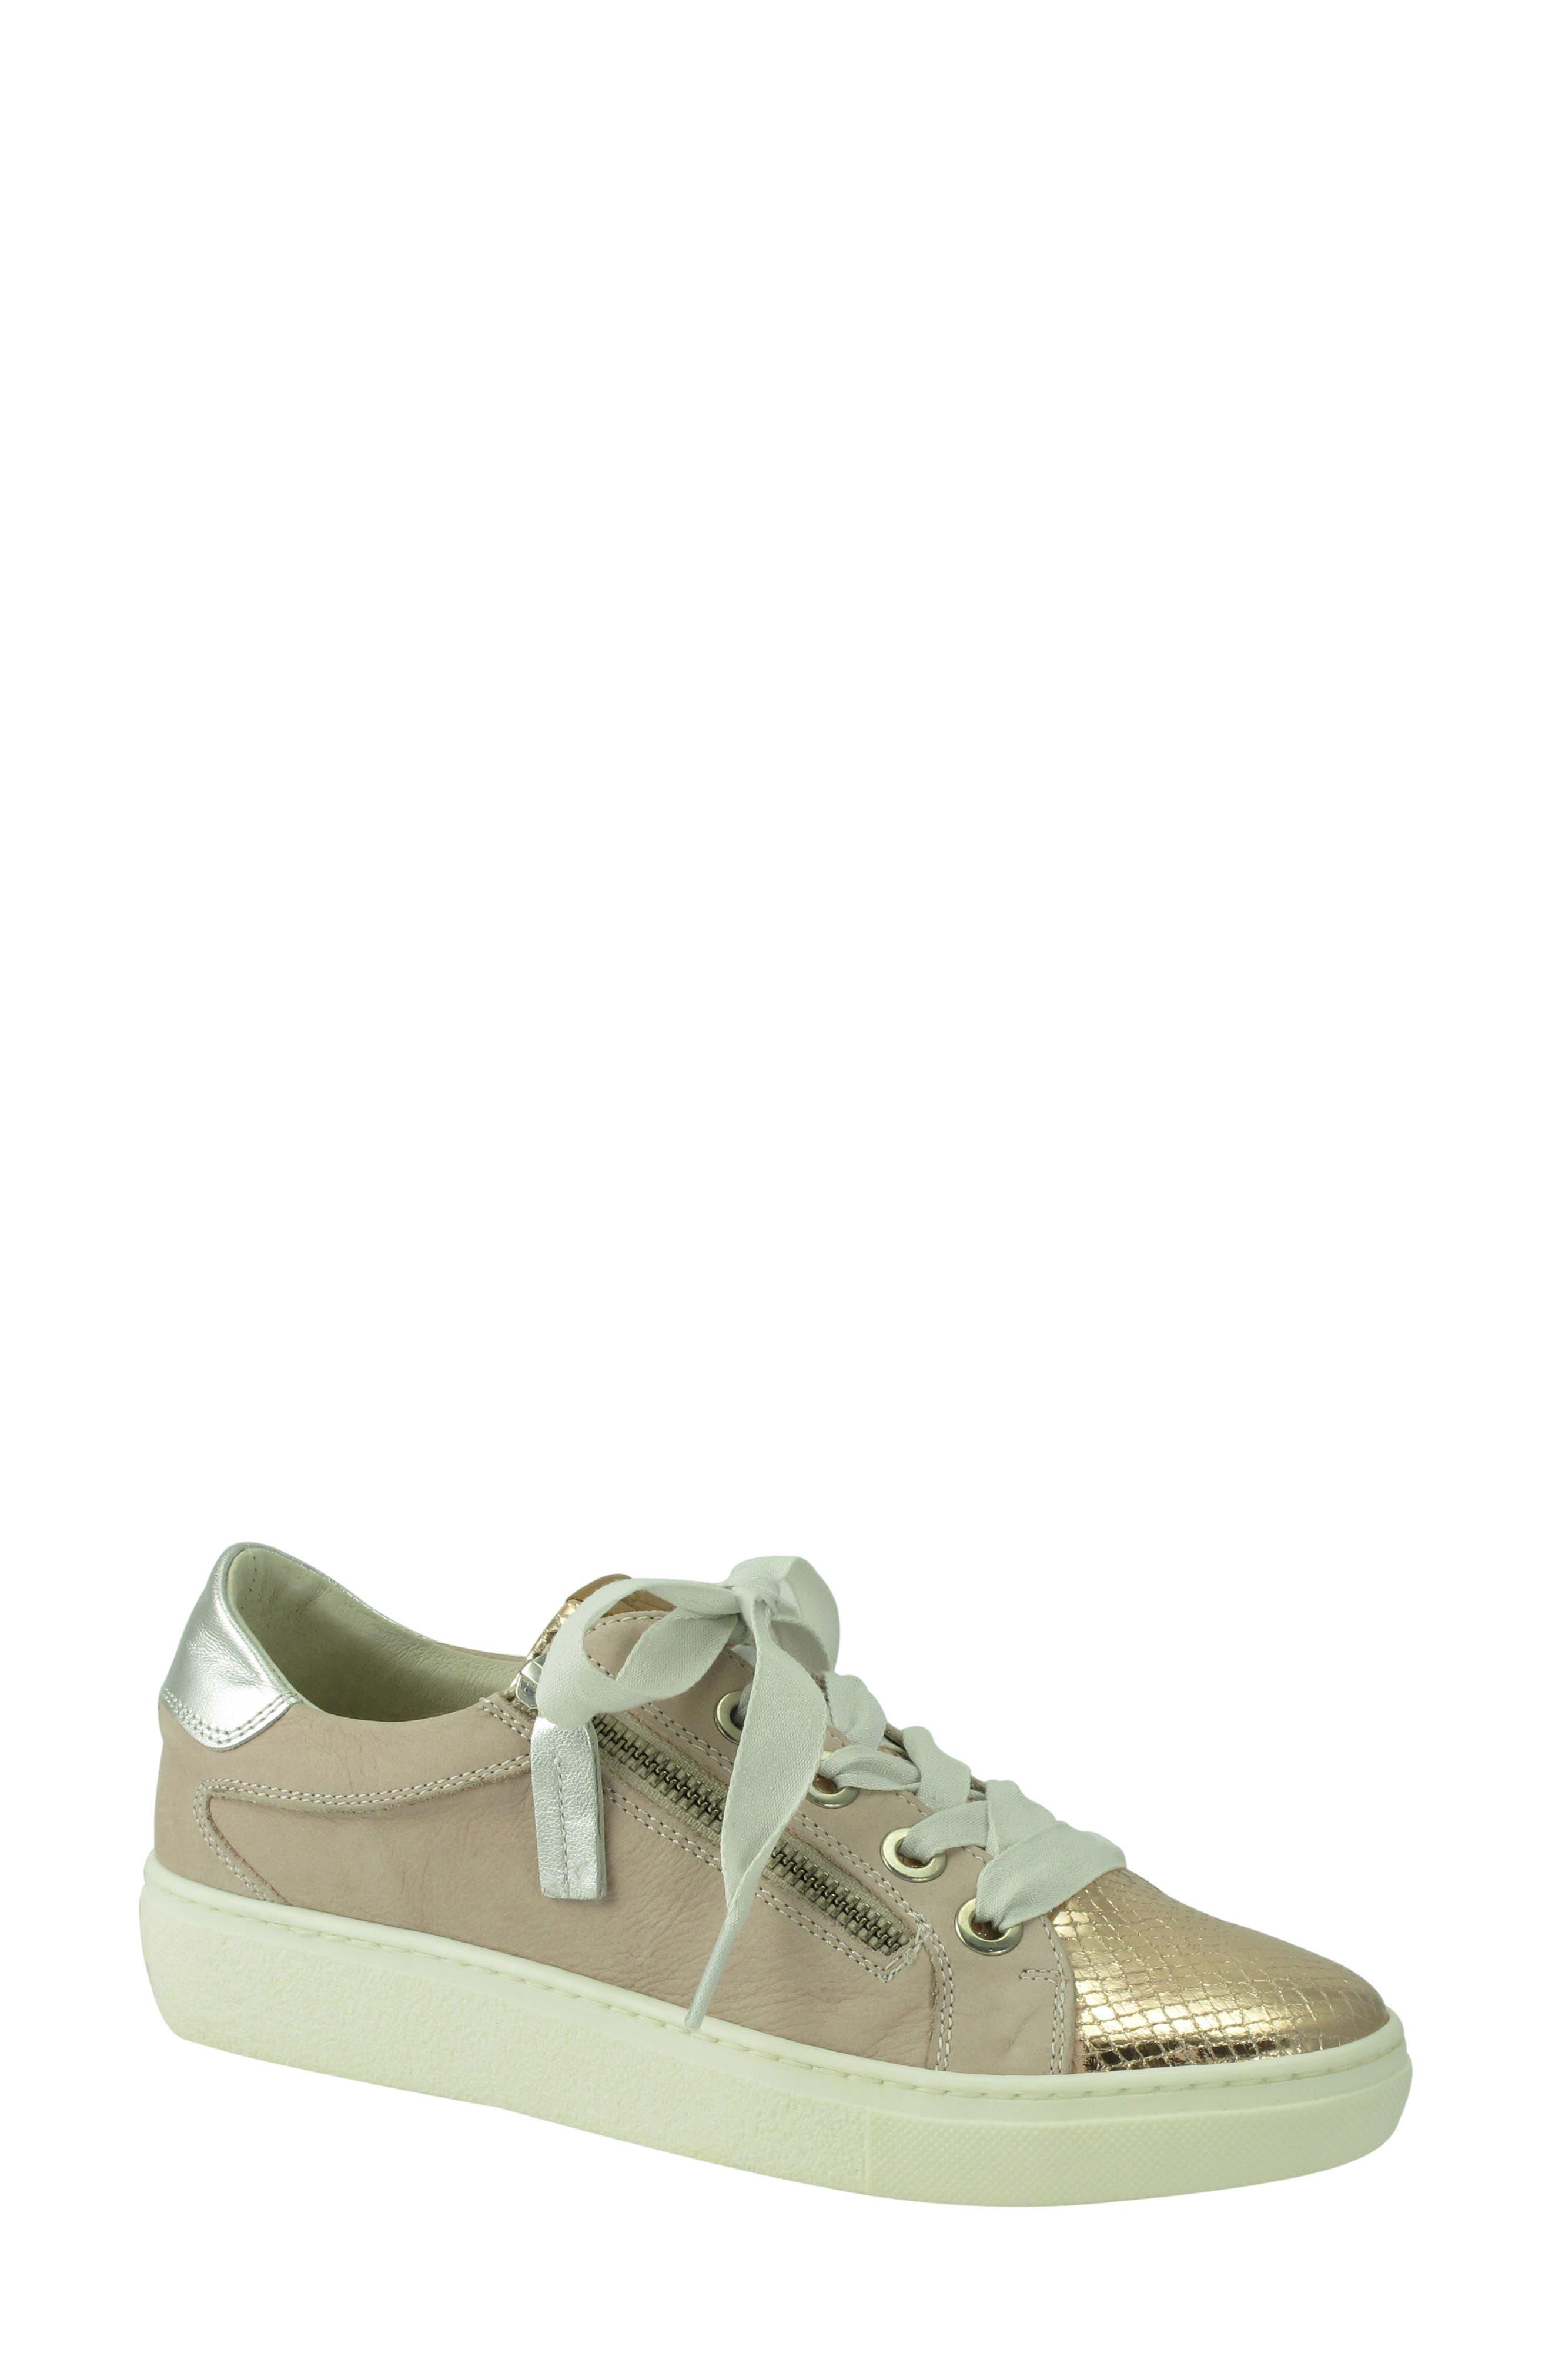 Orabella Weatherproof Sneaker,                         Main,                         color, Blush Nubuck